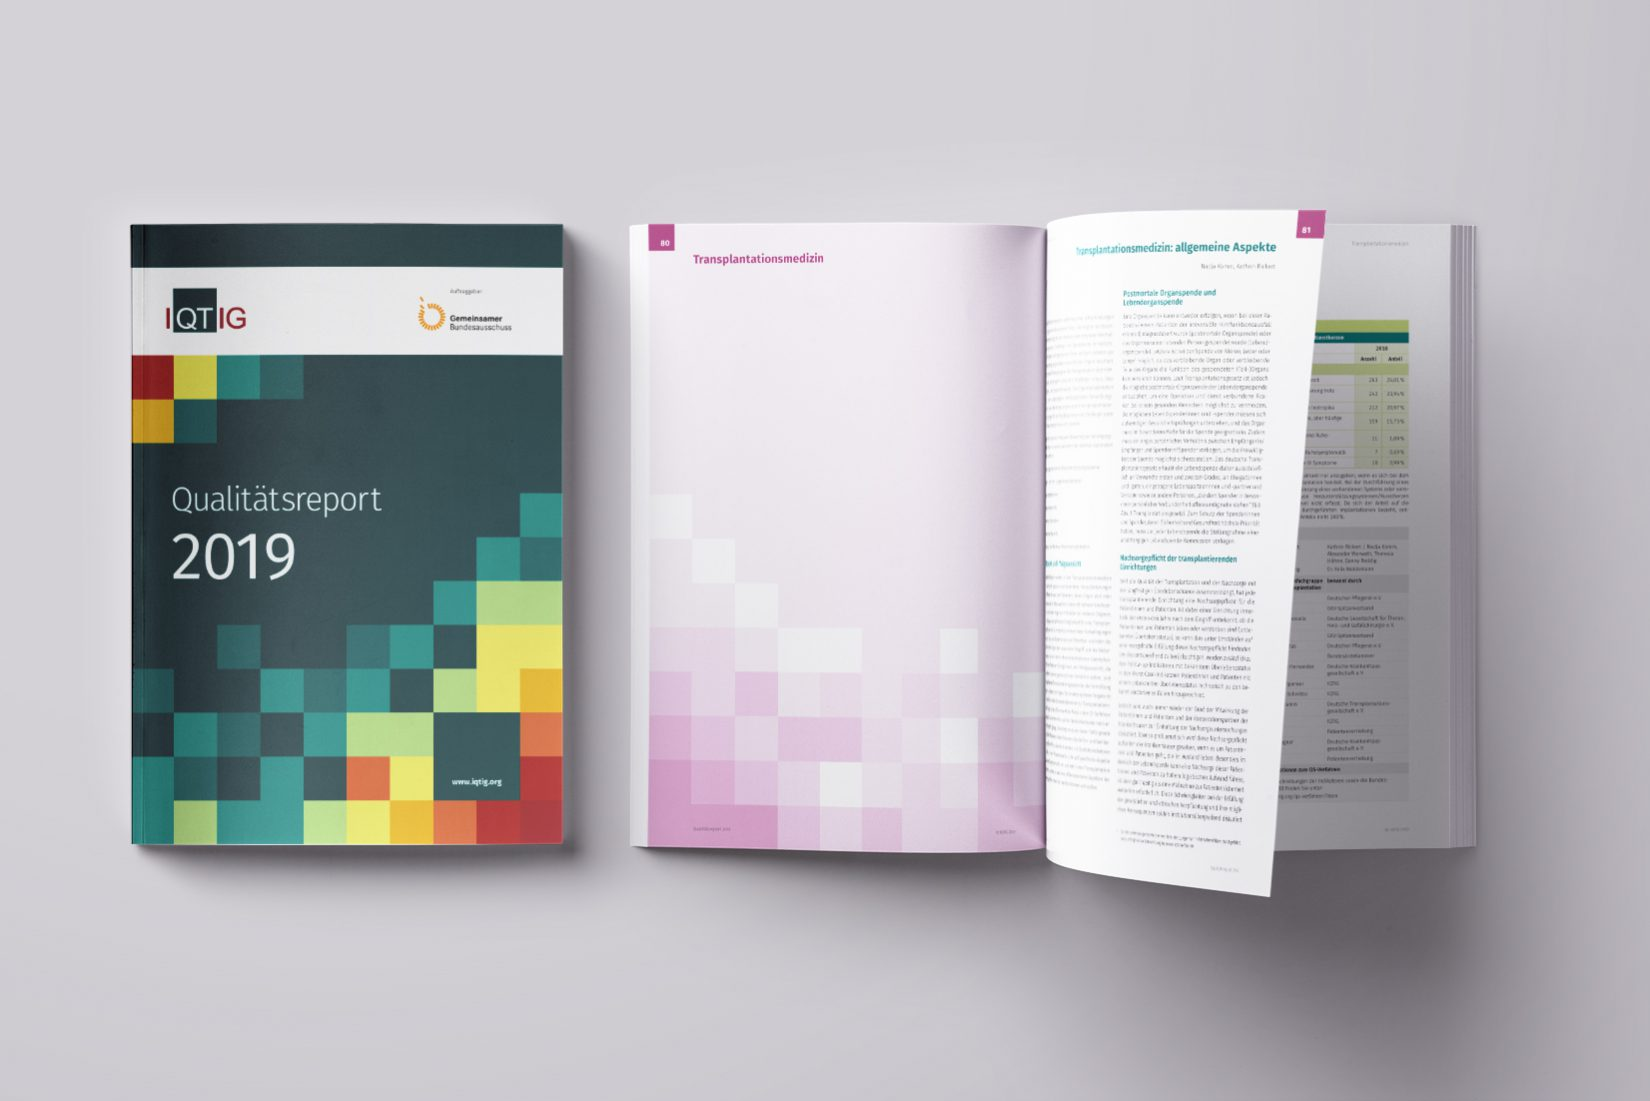 IQTIG - Qualitätsreport 2019